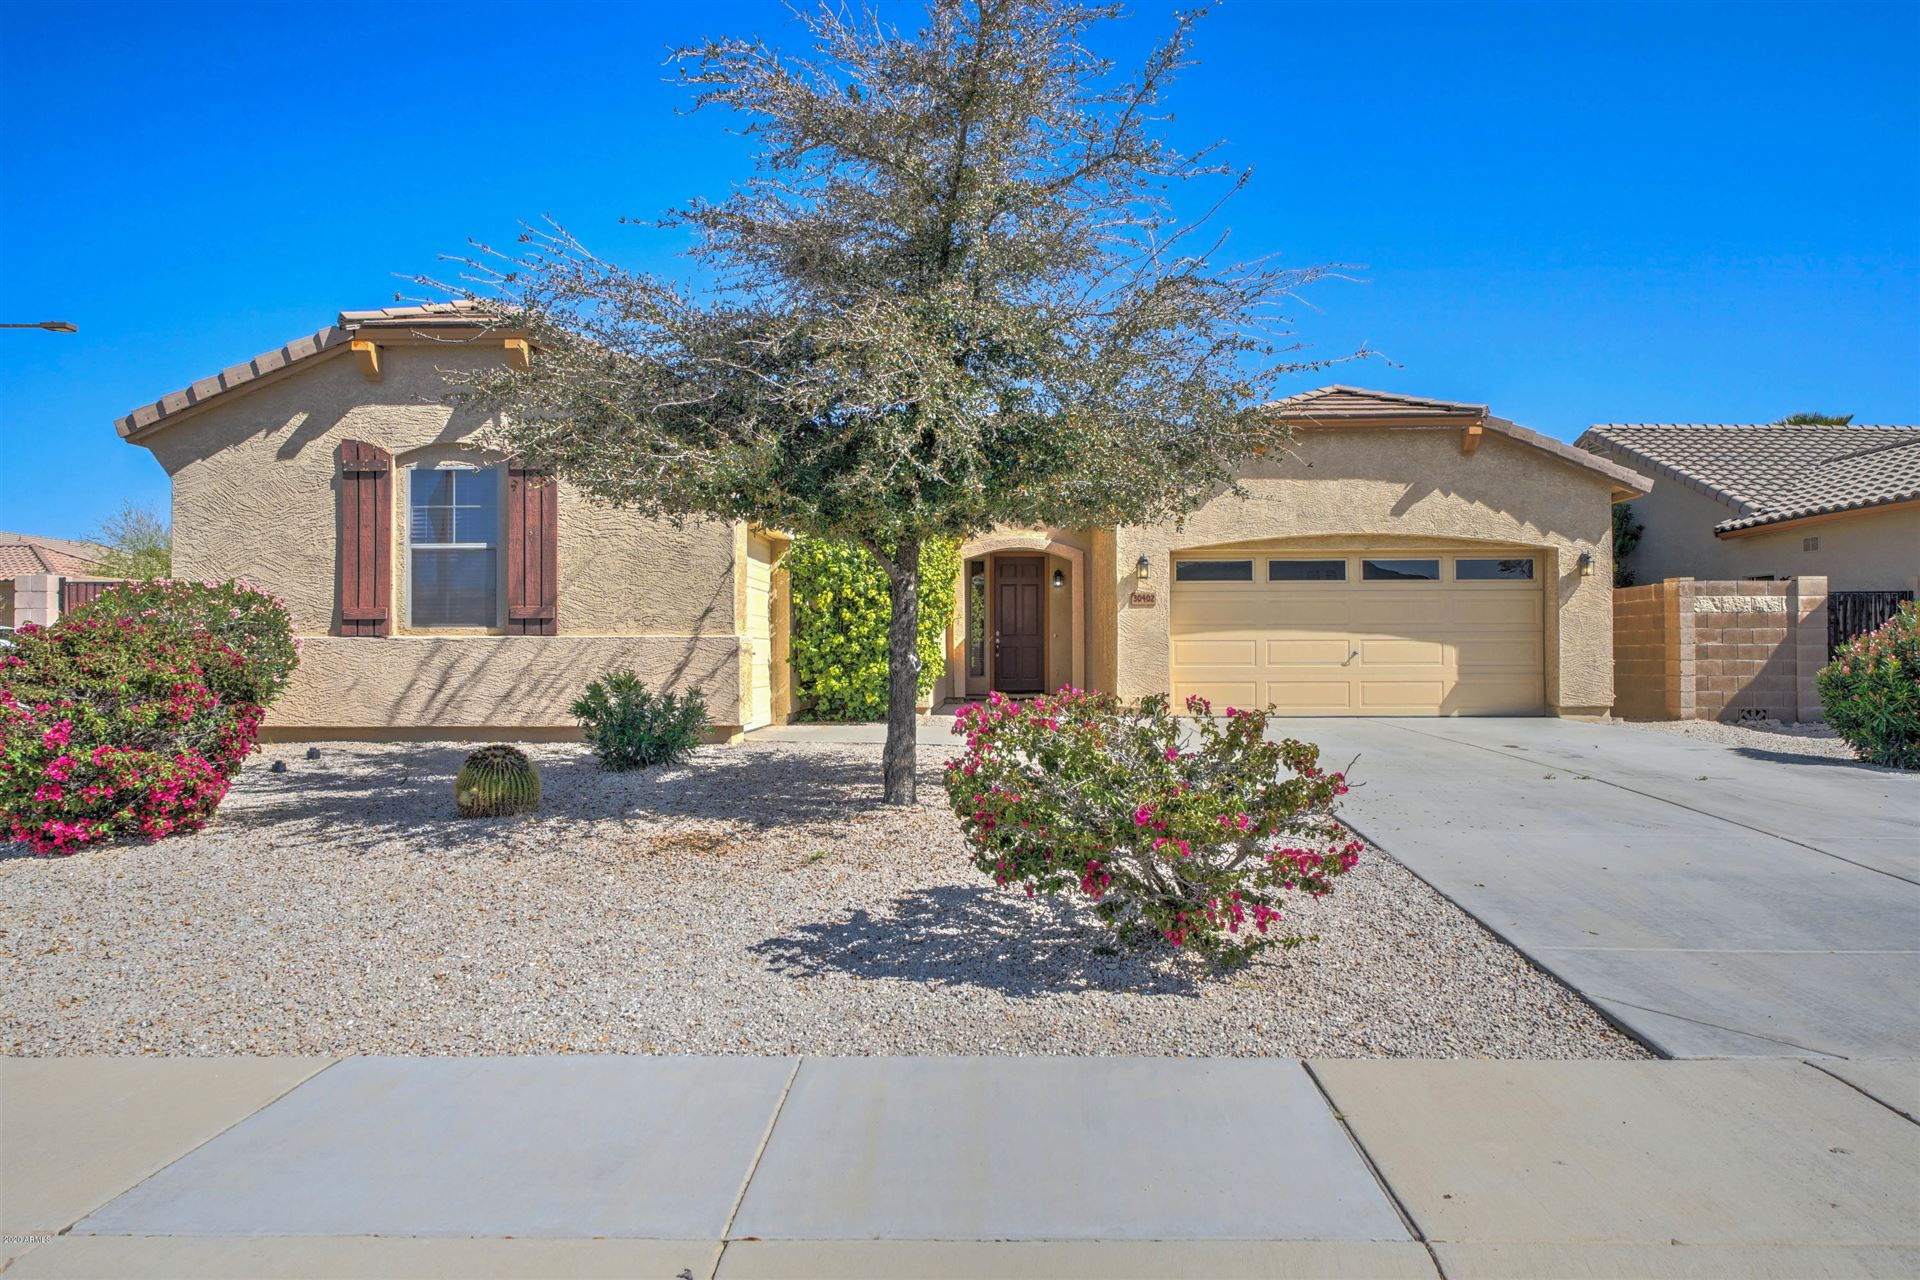 30402 W Whitton Avenue, Buckeye, AZ 85396 - #: 6050252